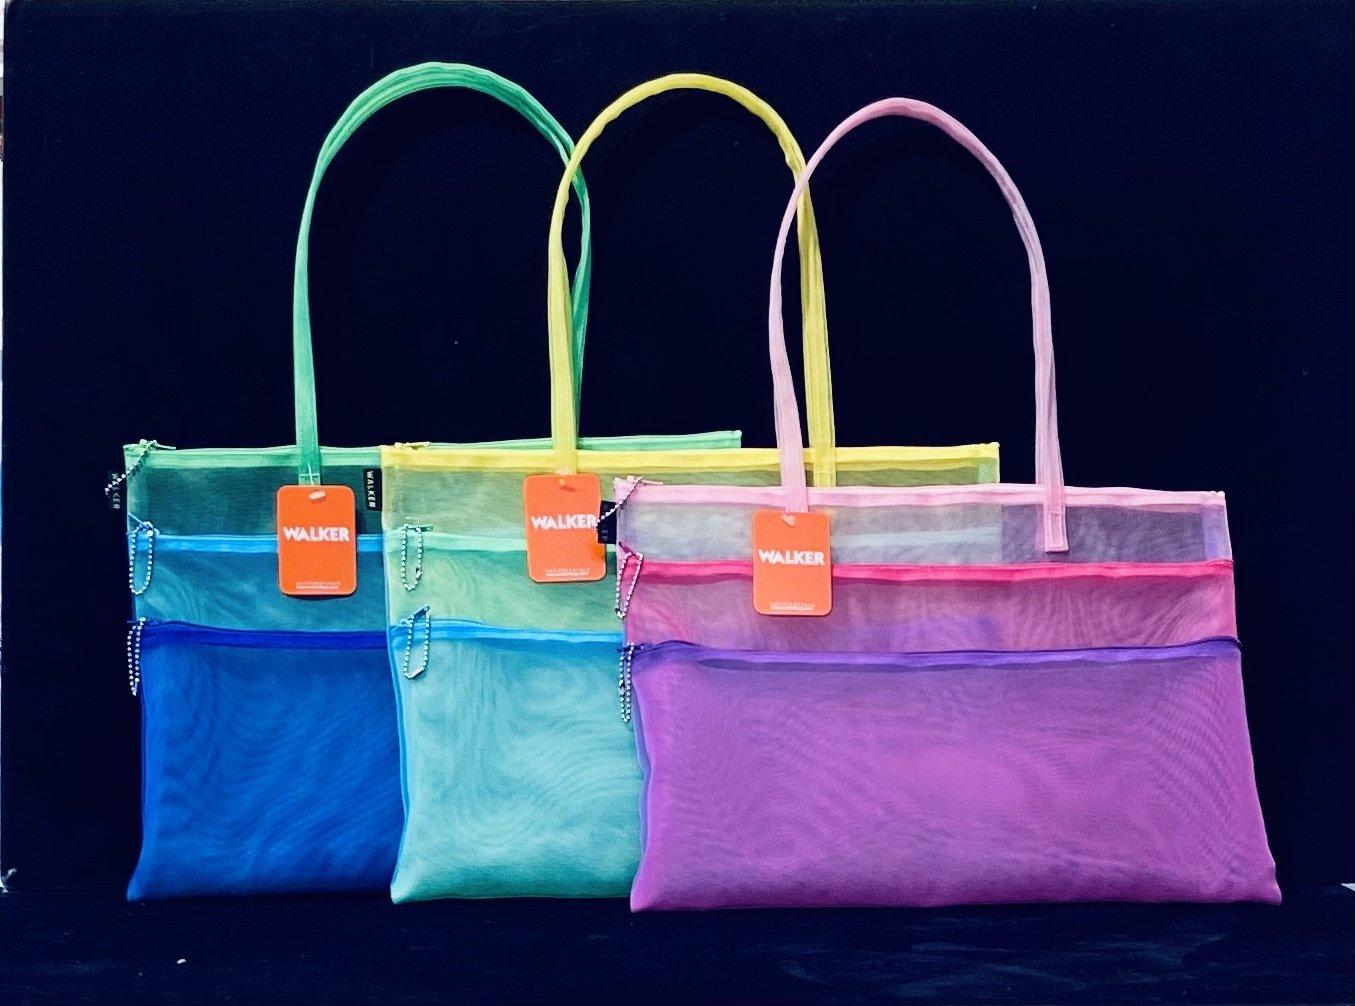 Walker Bags-Triple Zip with Handle (11 x 14)